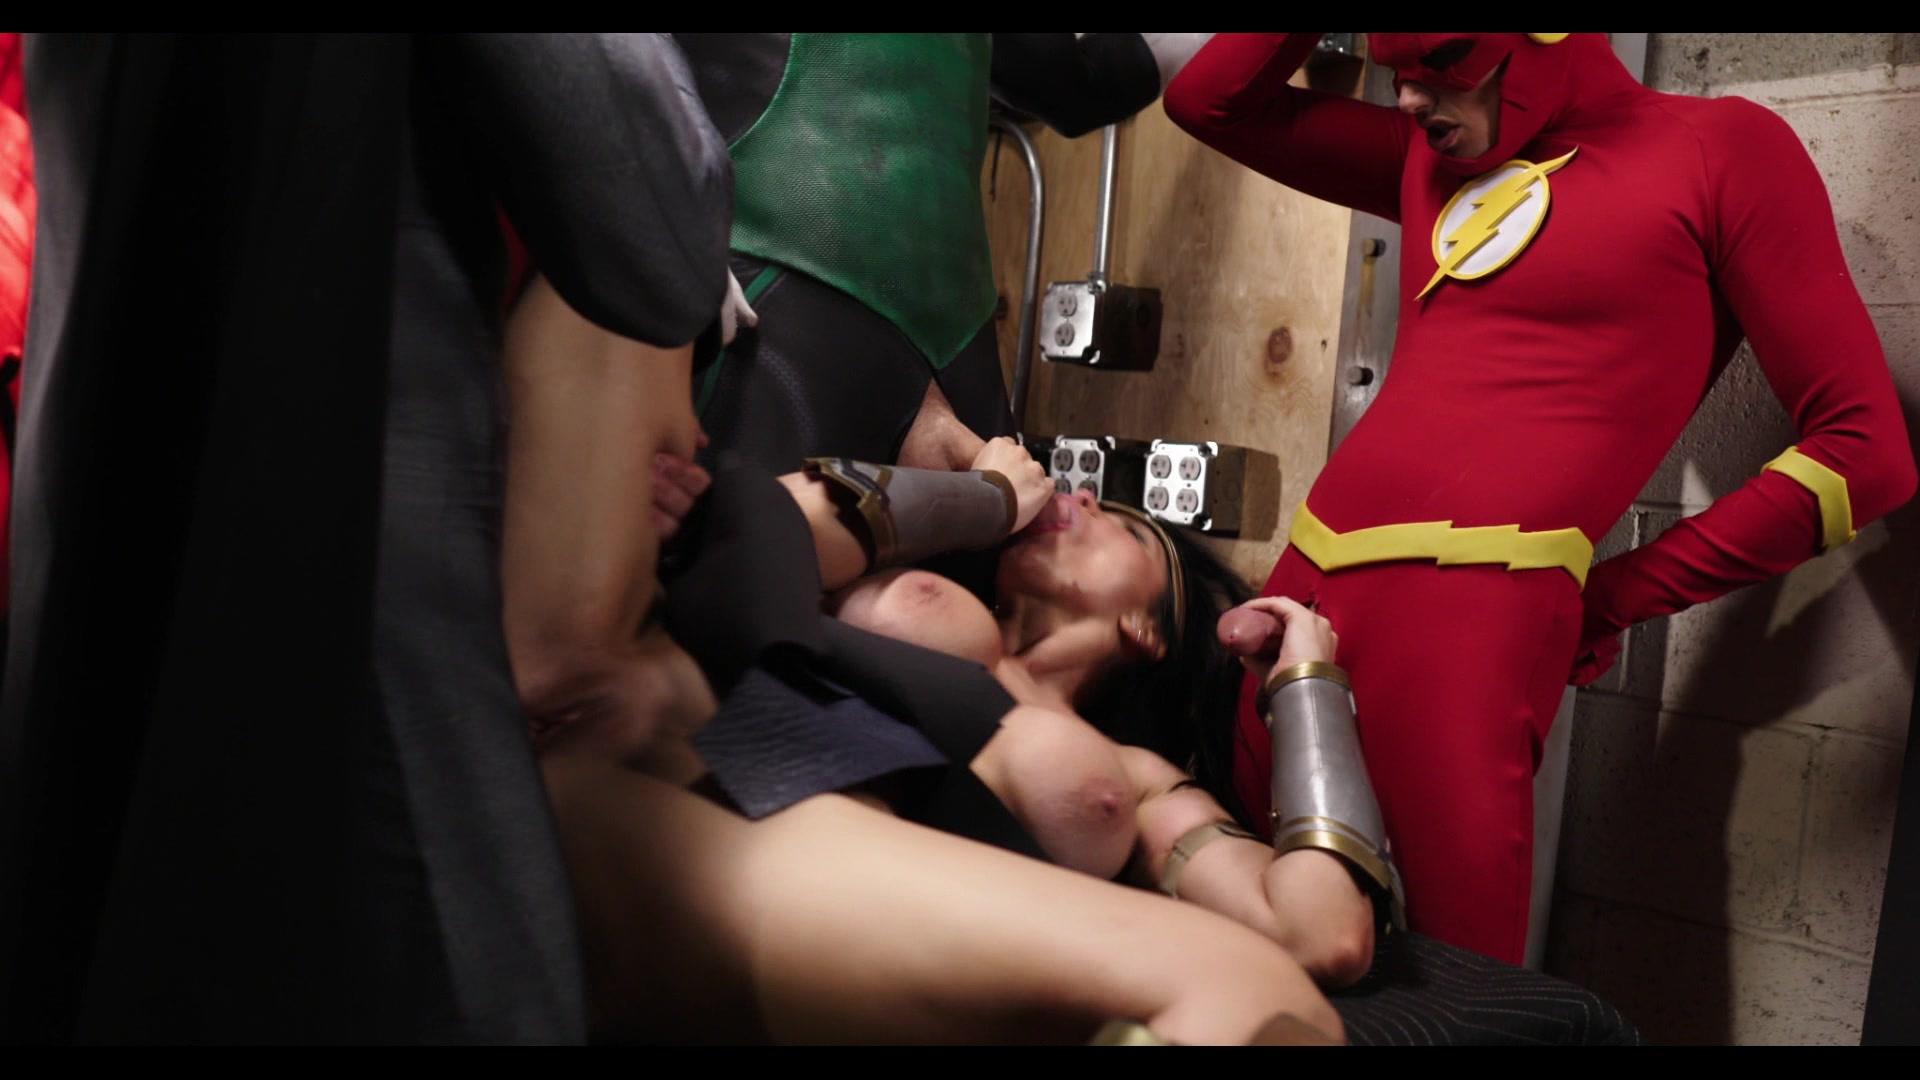 Scene with Xander Corvus, Tyler Nixon and Romi Rain - image 15 out of 20